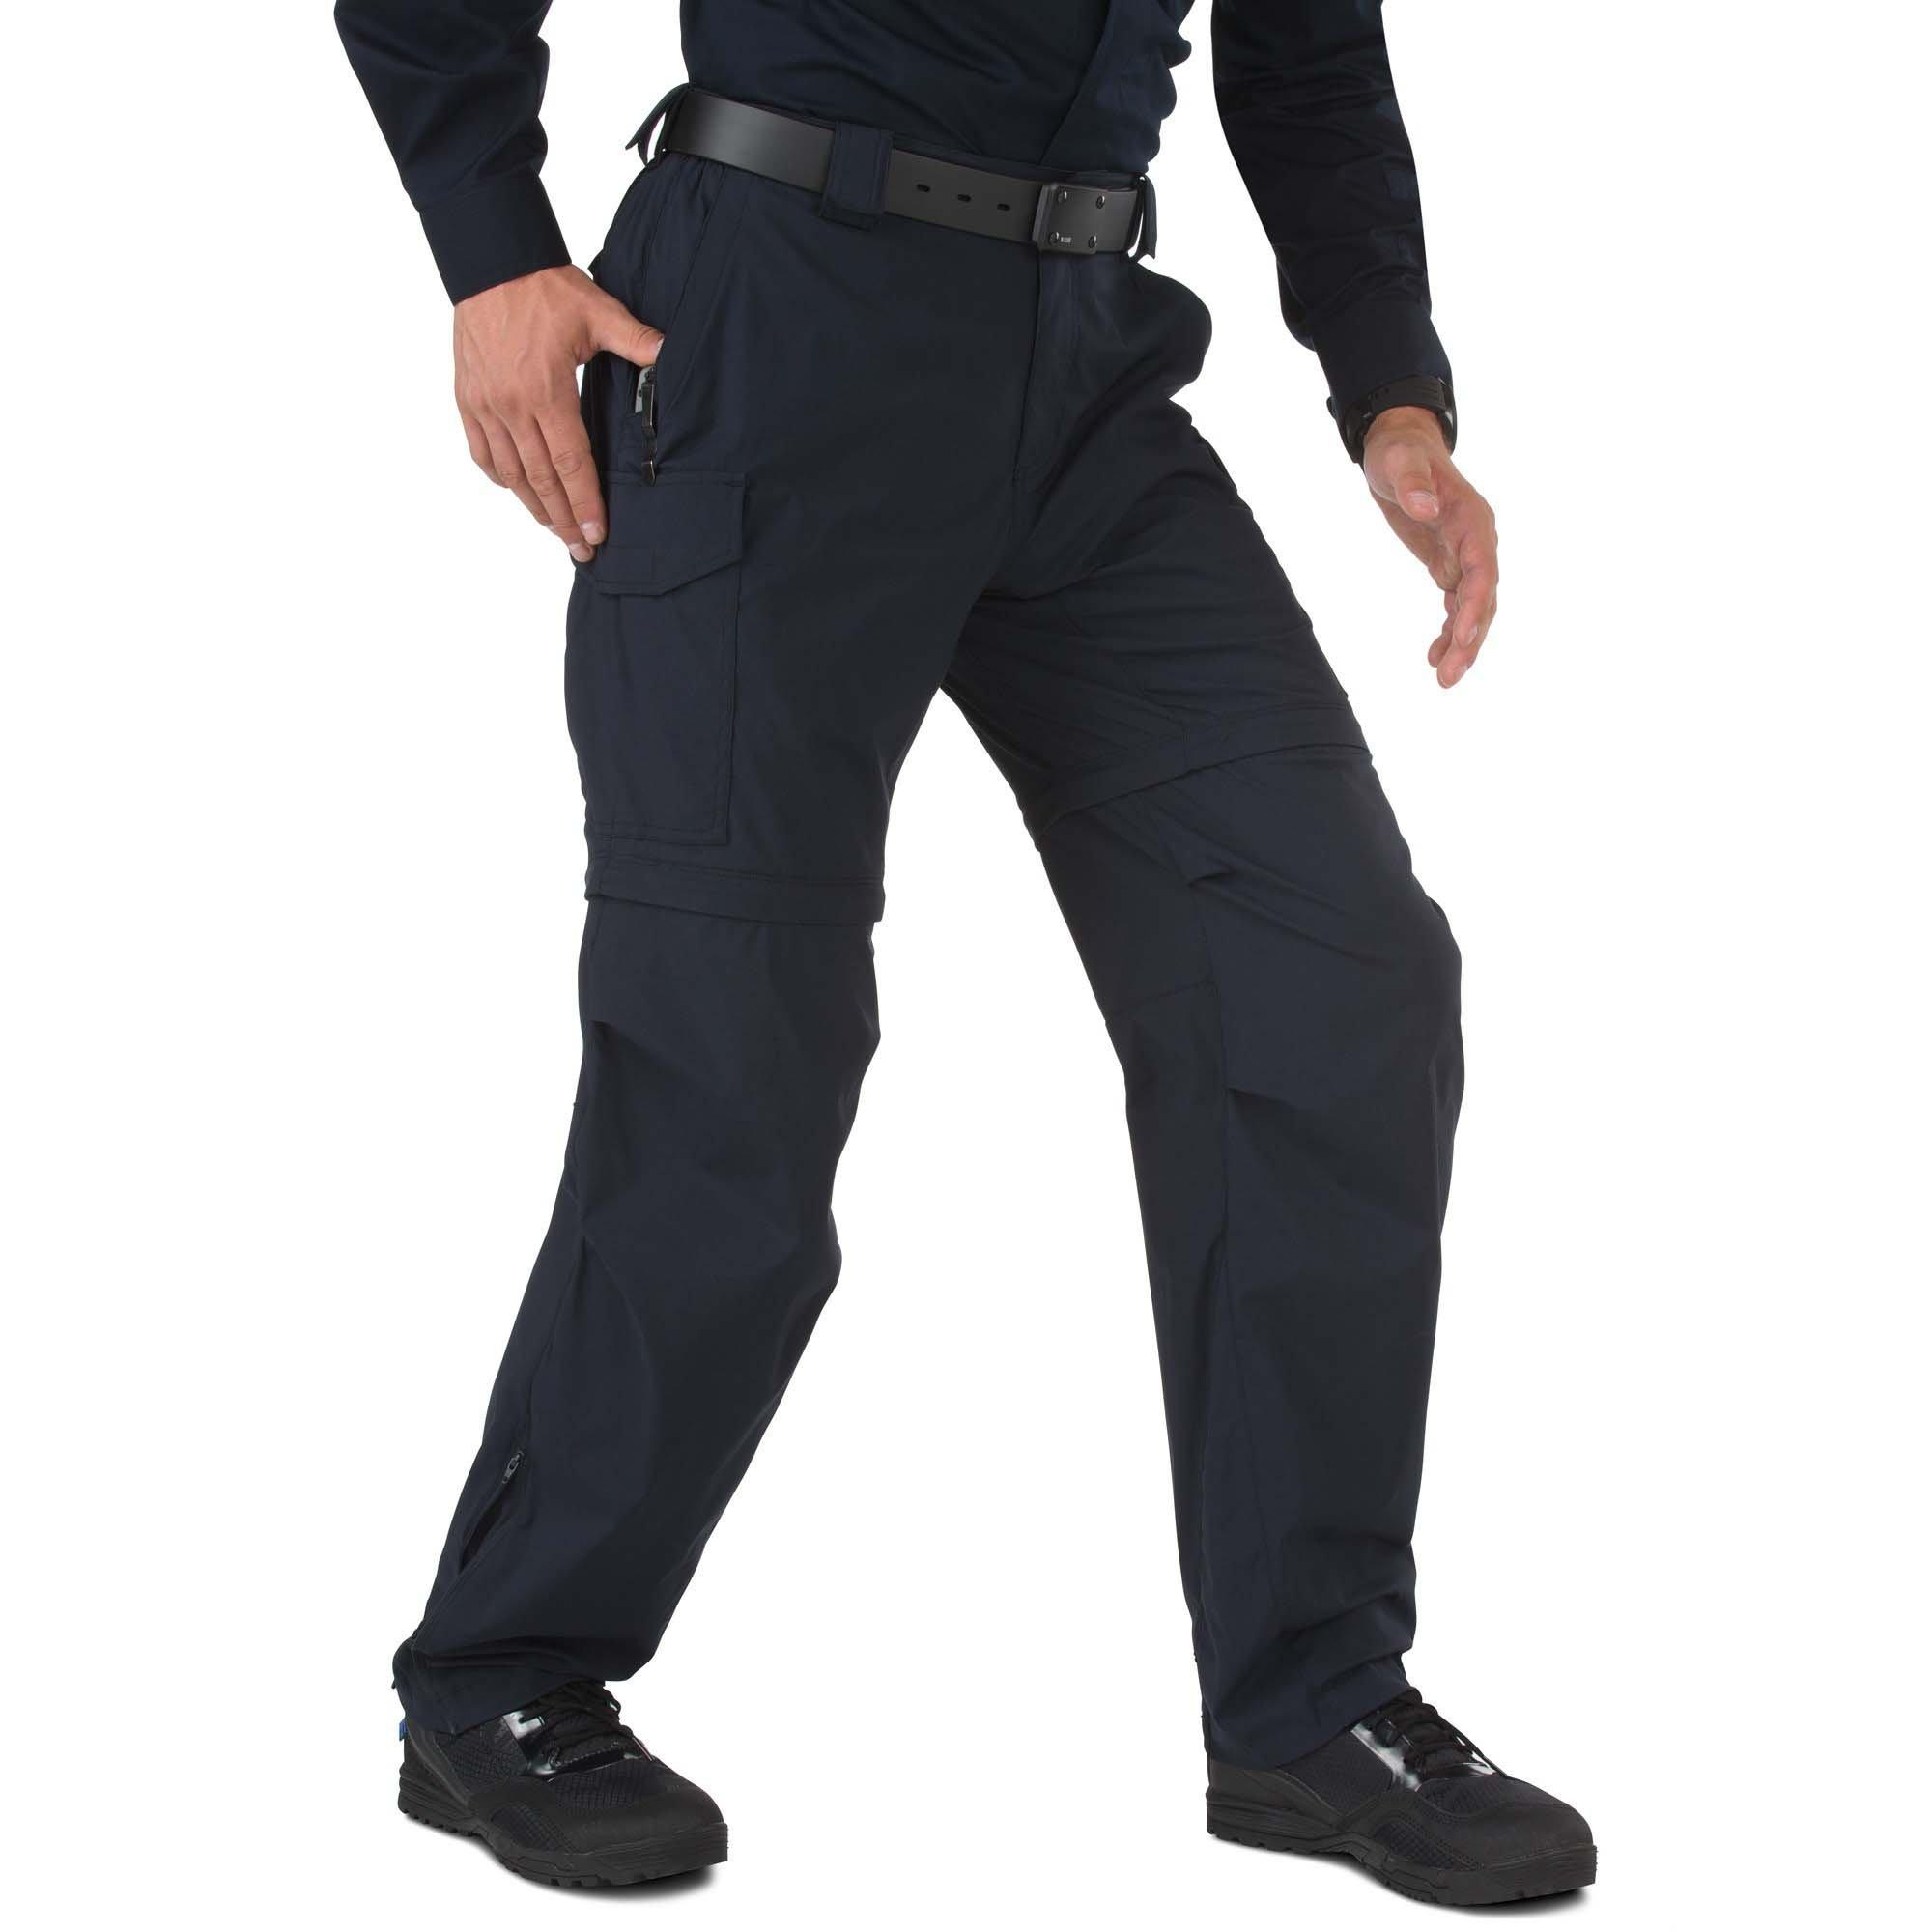 5.11 Men's Bike Patrol Pants, Dark Navy, 34-Waist/34-Length